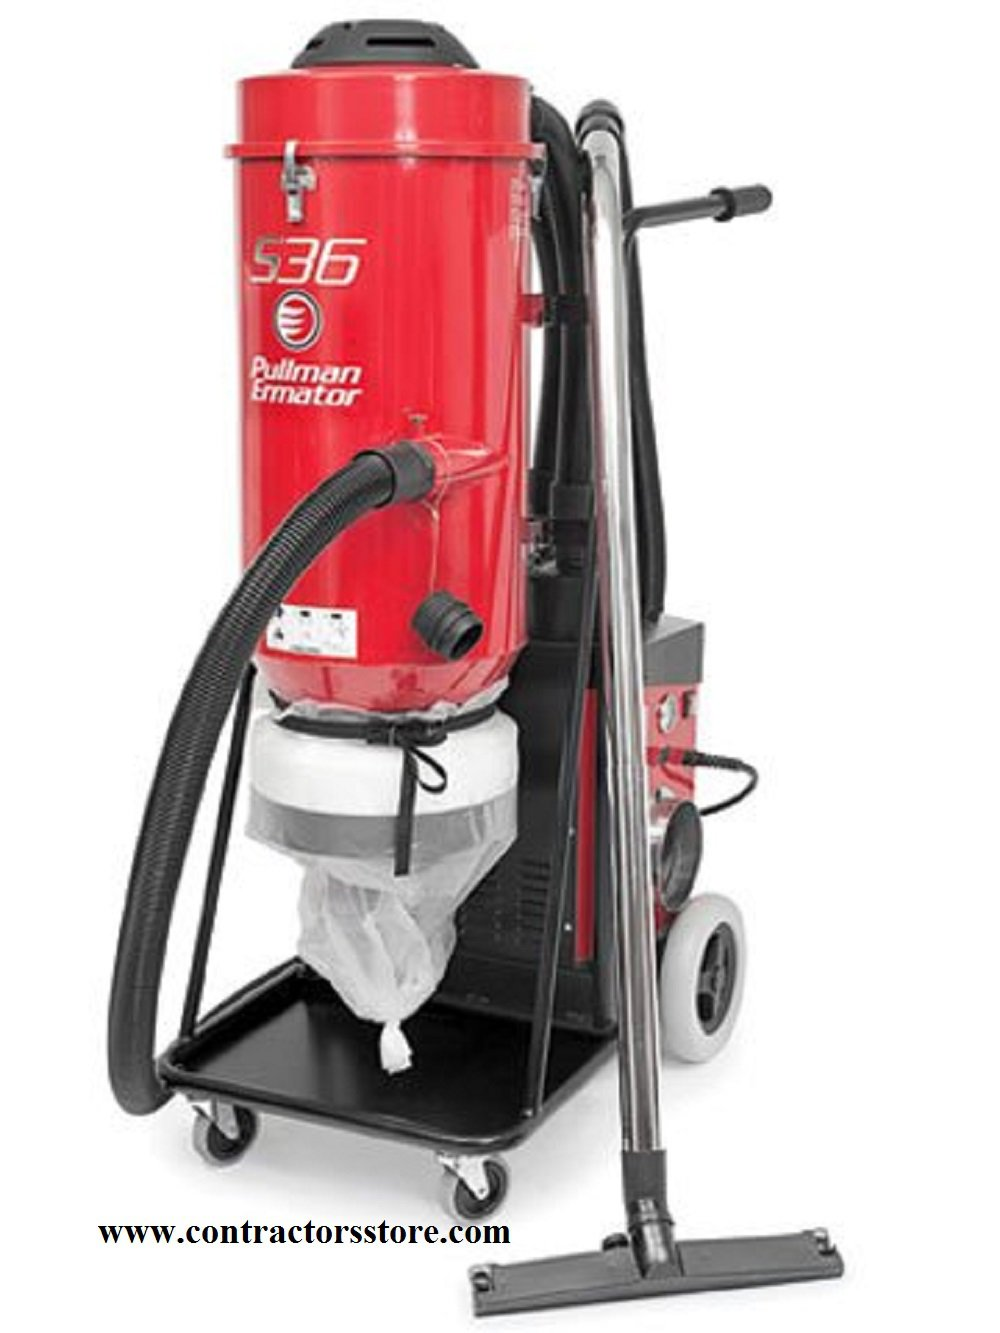 Line Art Extractor : Ermator s dust extractor single phase hepa v